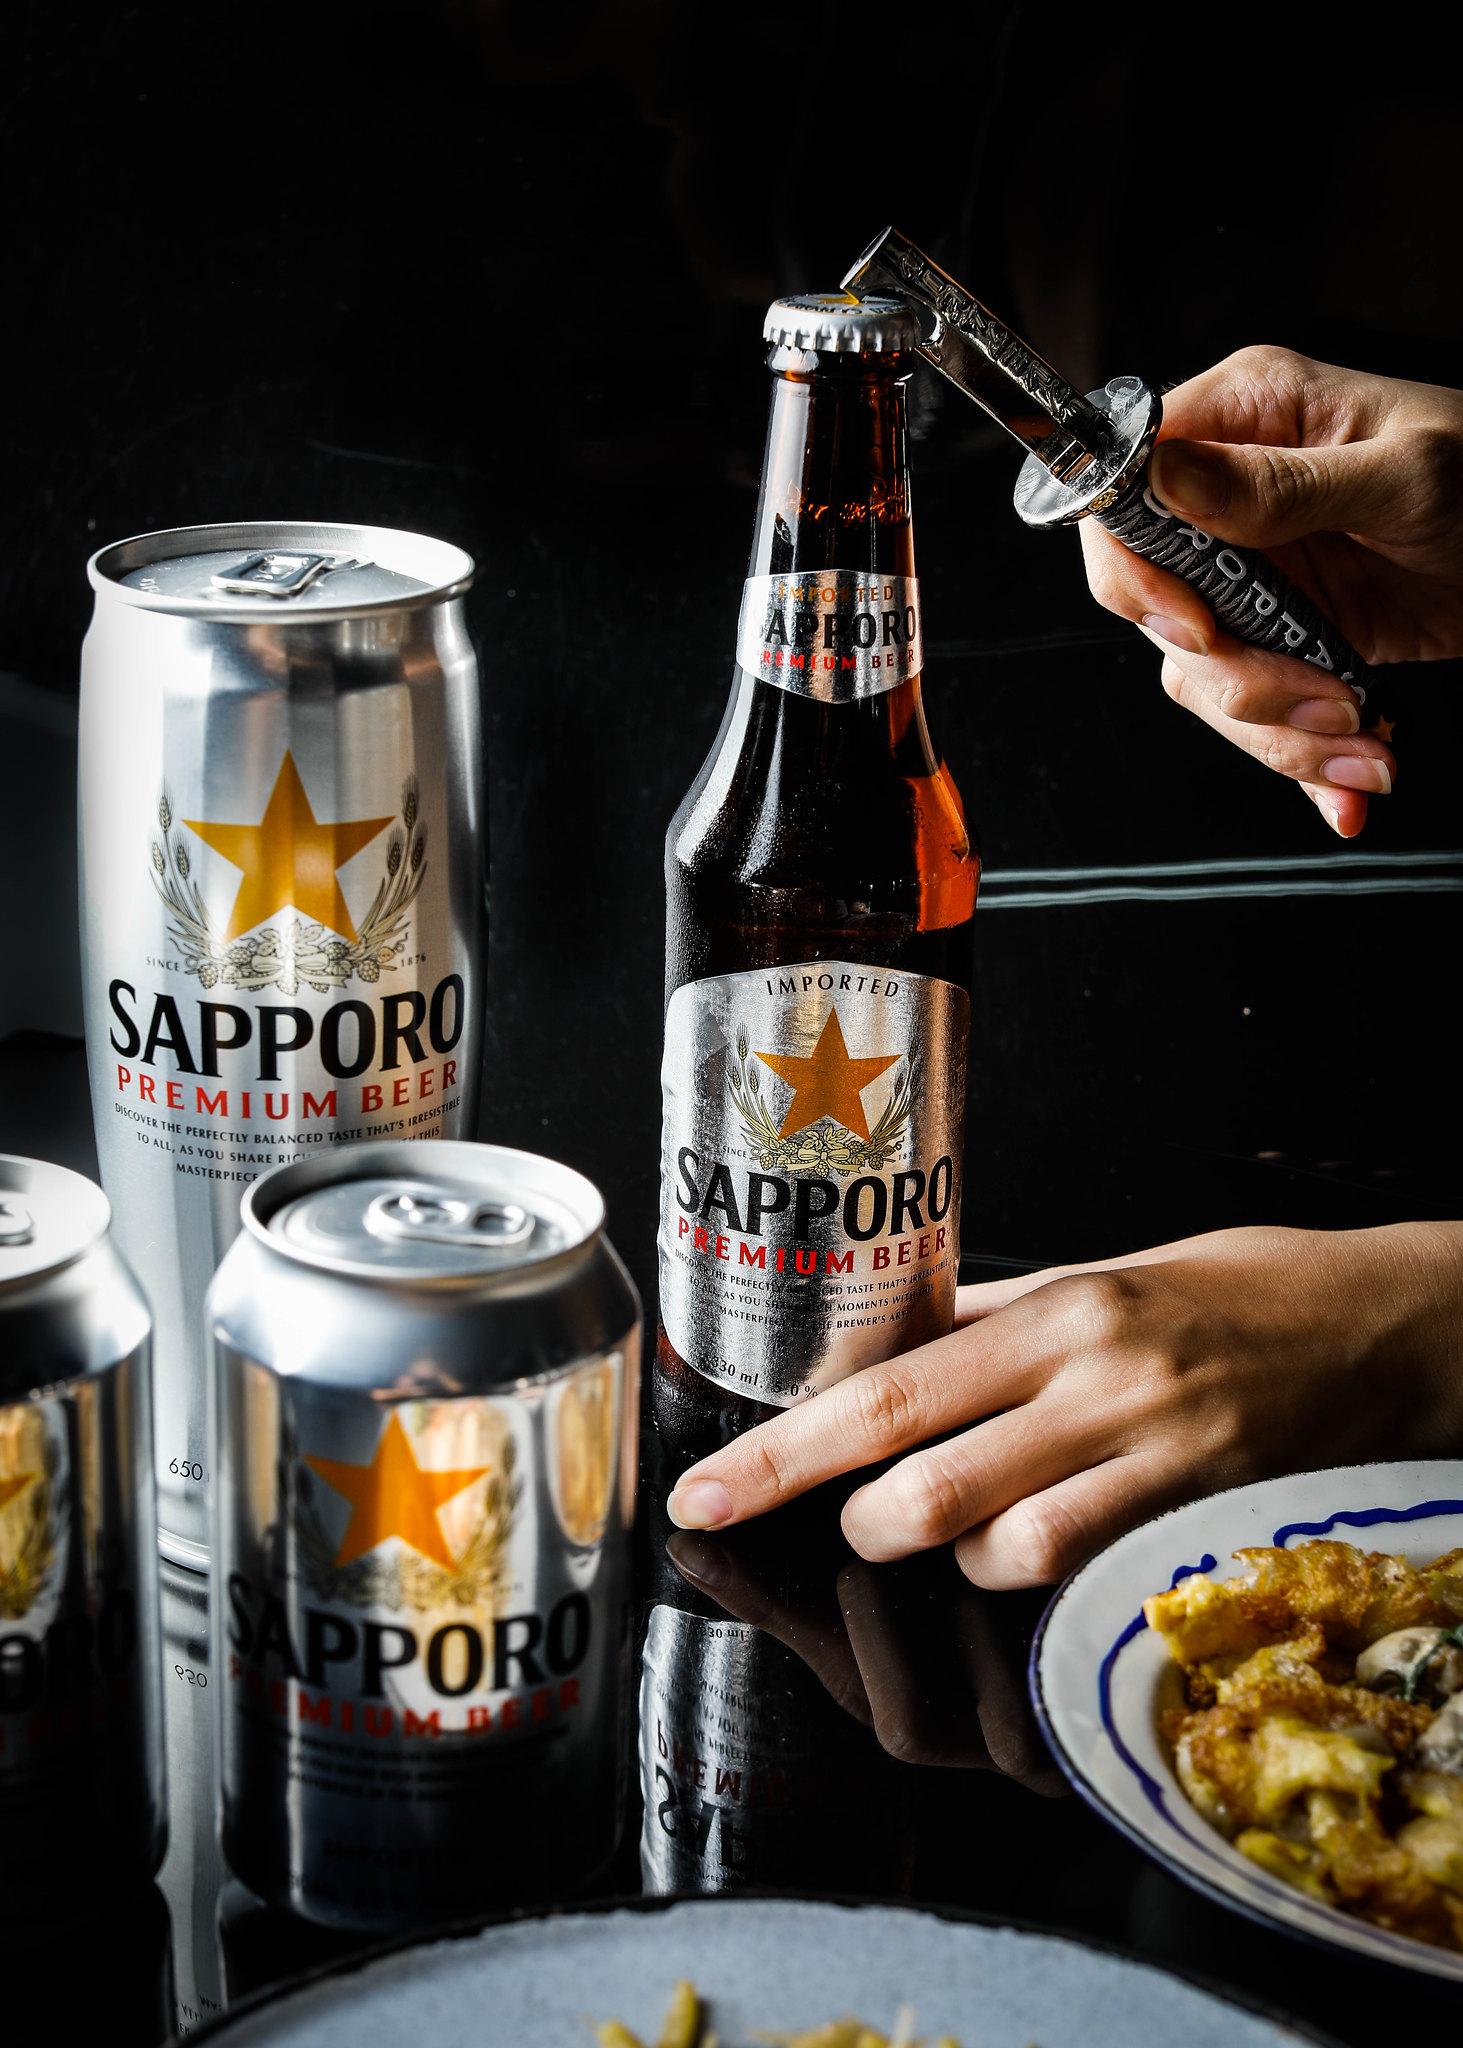 Opening Sapporo Premium beer